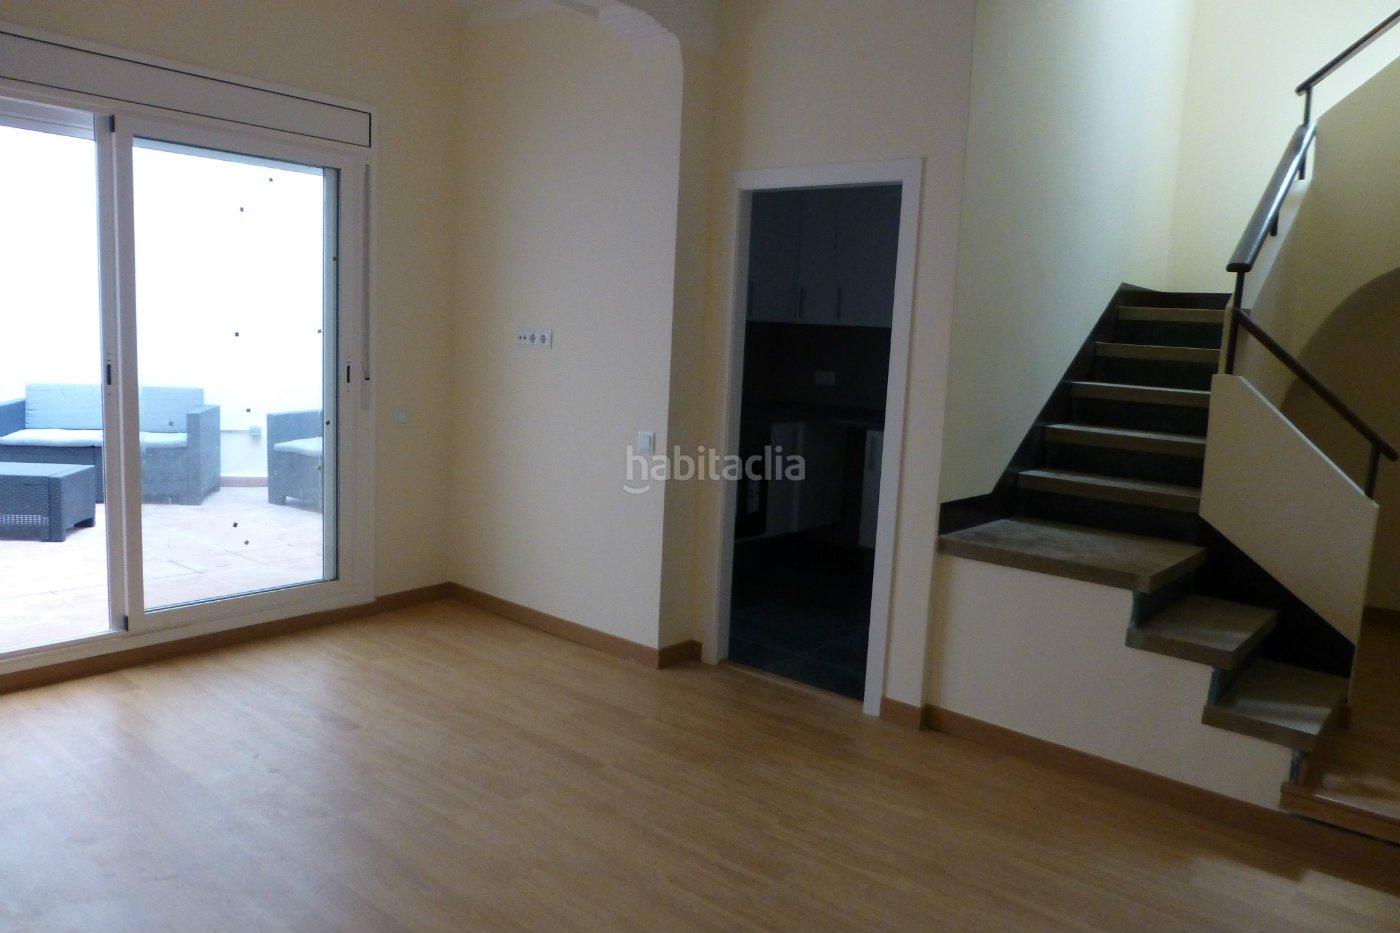 Alquiler casa por en zona vilapiscina en vilapicina for Pisos alquiler vilapicina